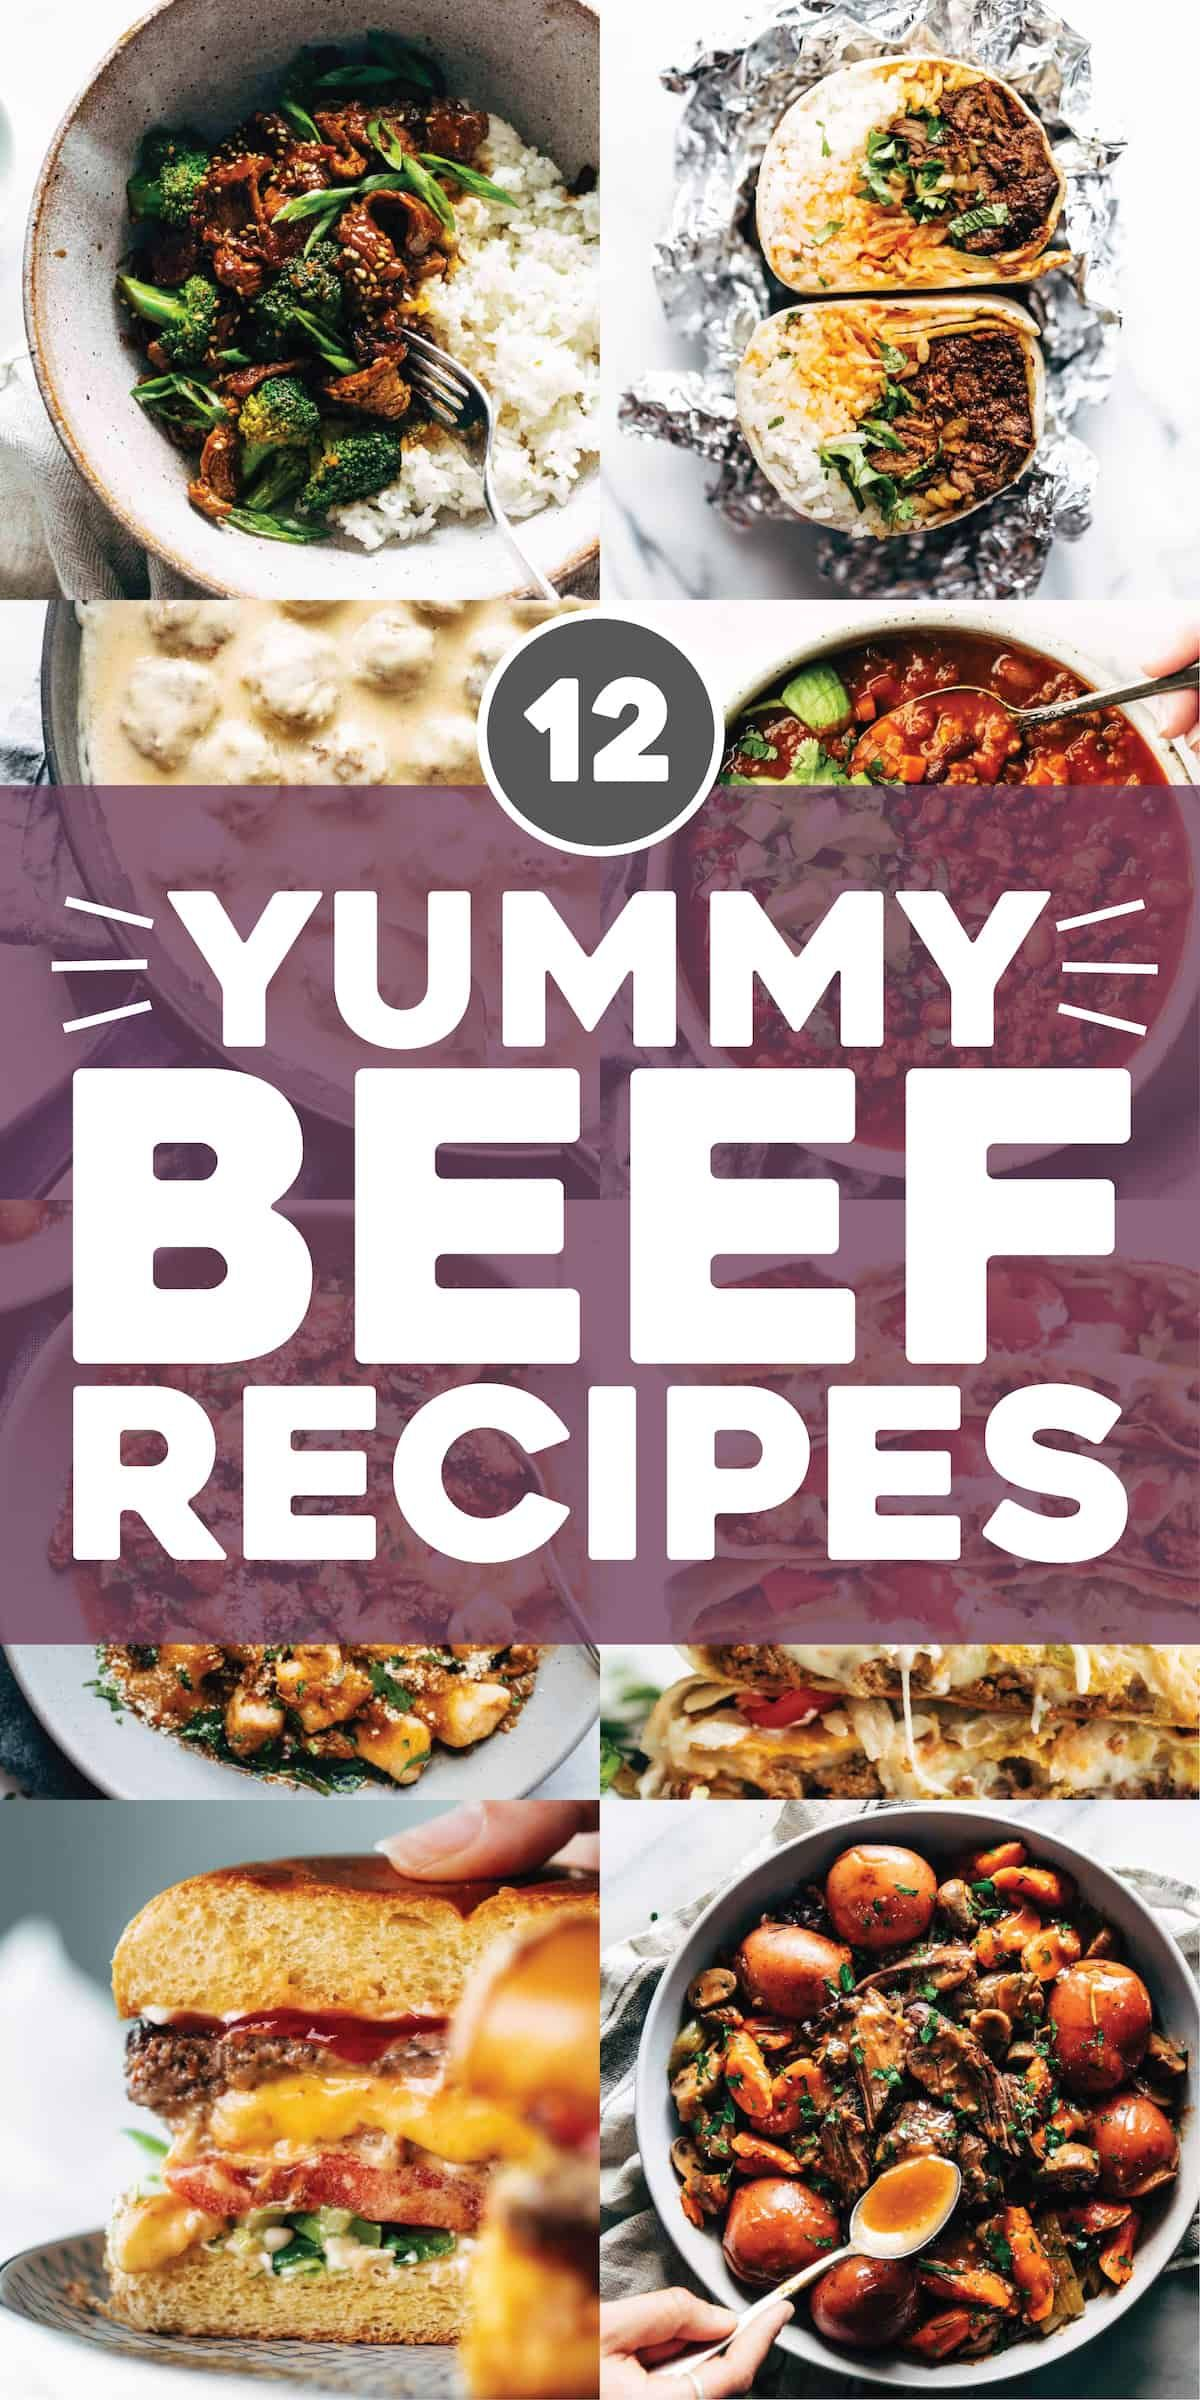 12 Yummy Beef Recipes Pinch Of Yum Beef Recipes Recipes Asian Vegetarian Recipes